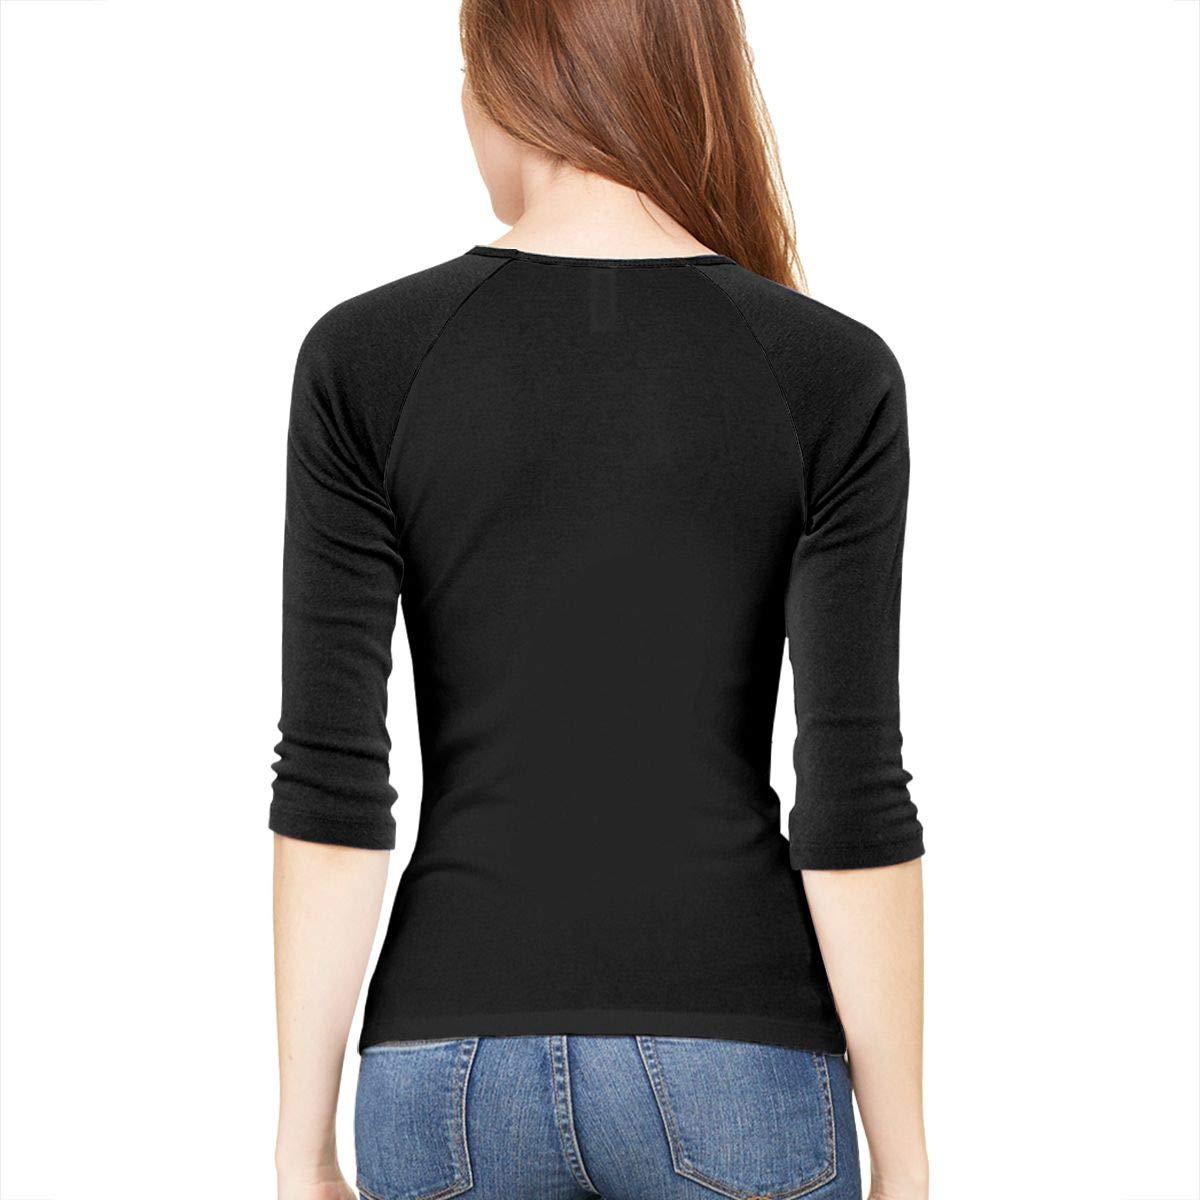 Killstar Adult Womens Long Sleeve Tee Shirts